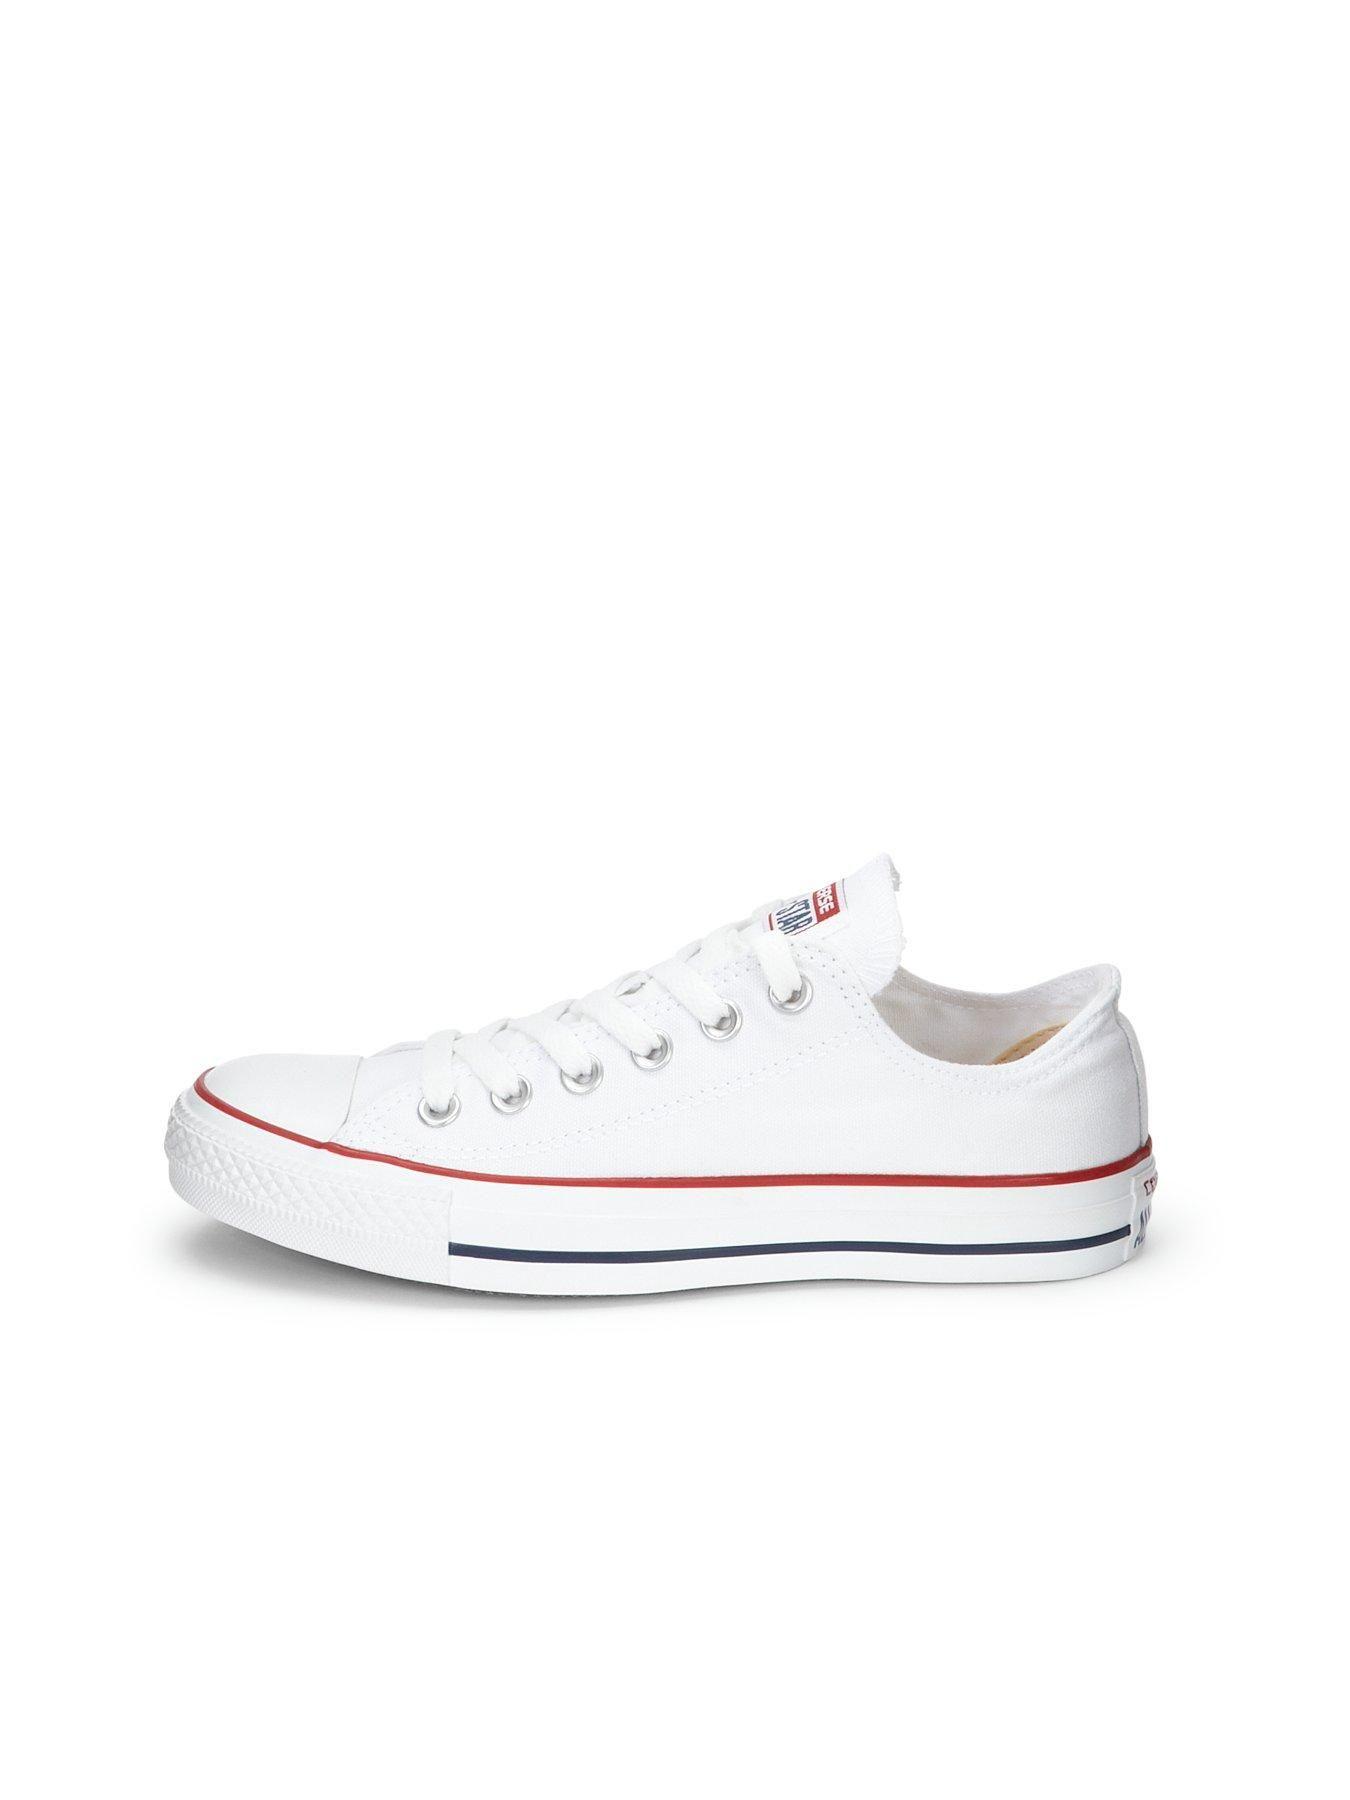 Converse Chuck Taylor All Star Ox Plimsolls White, White